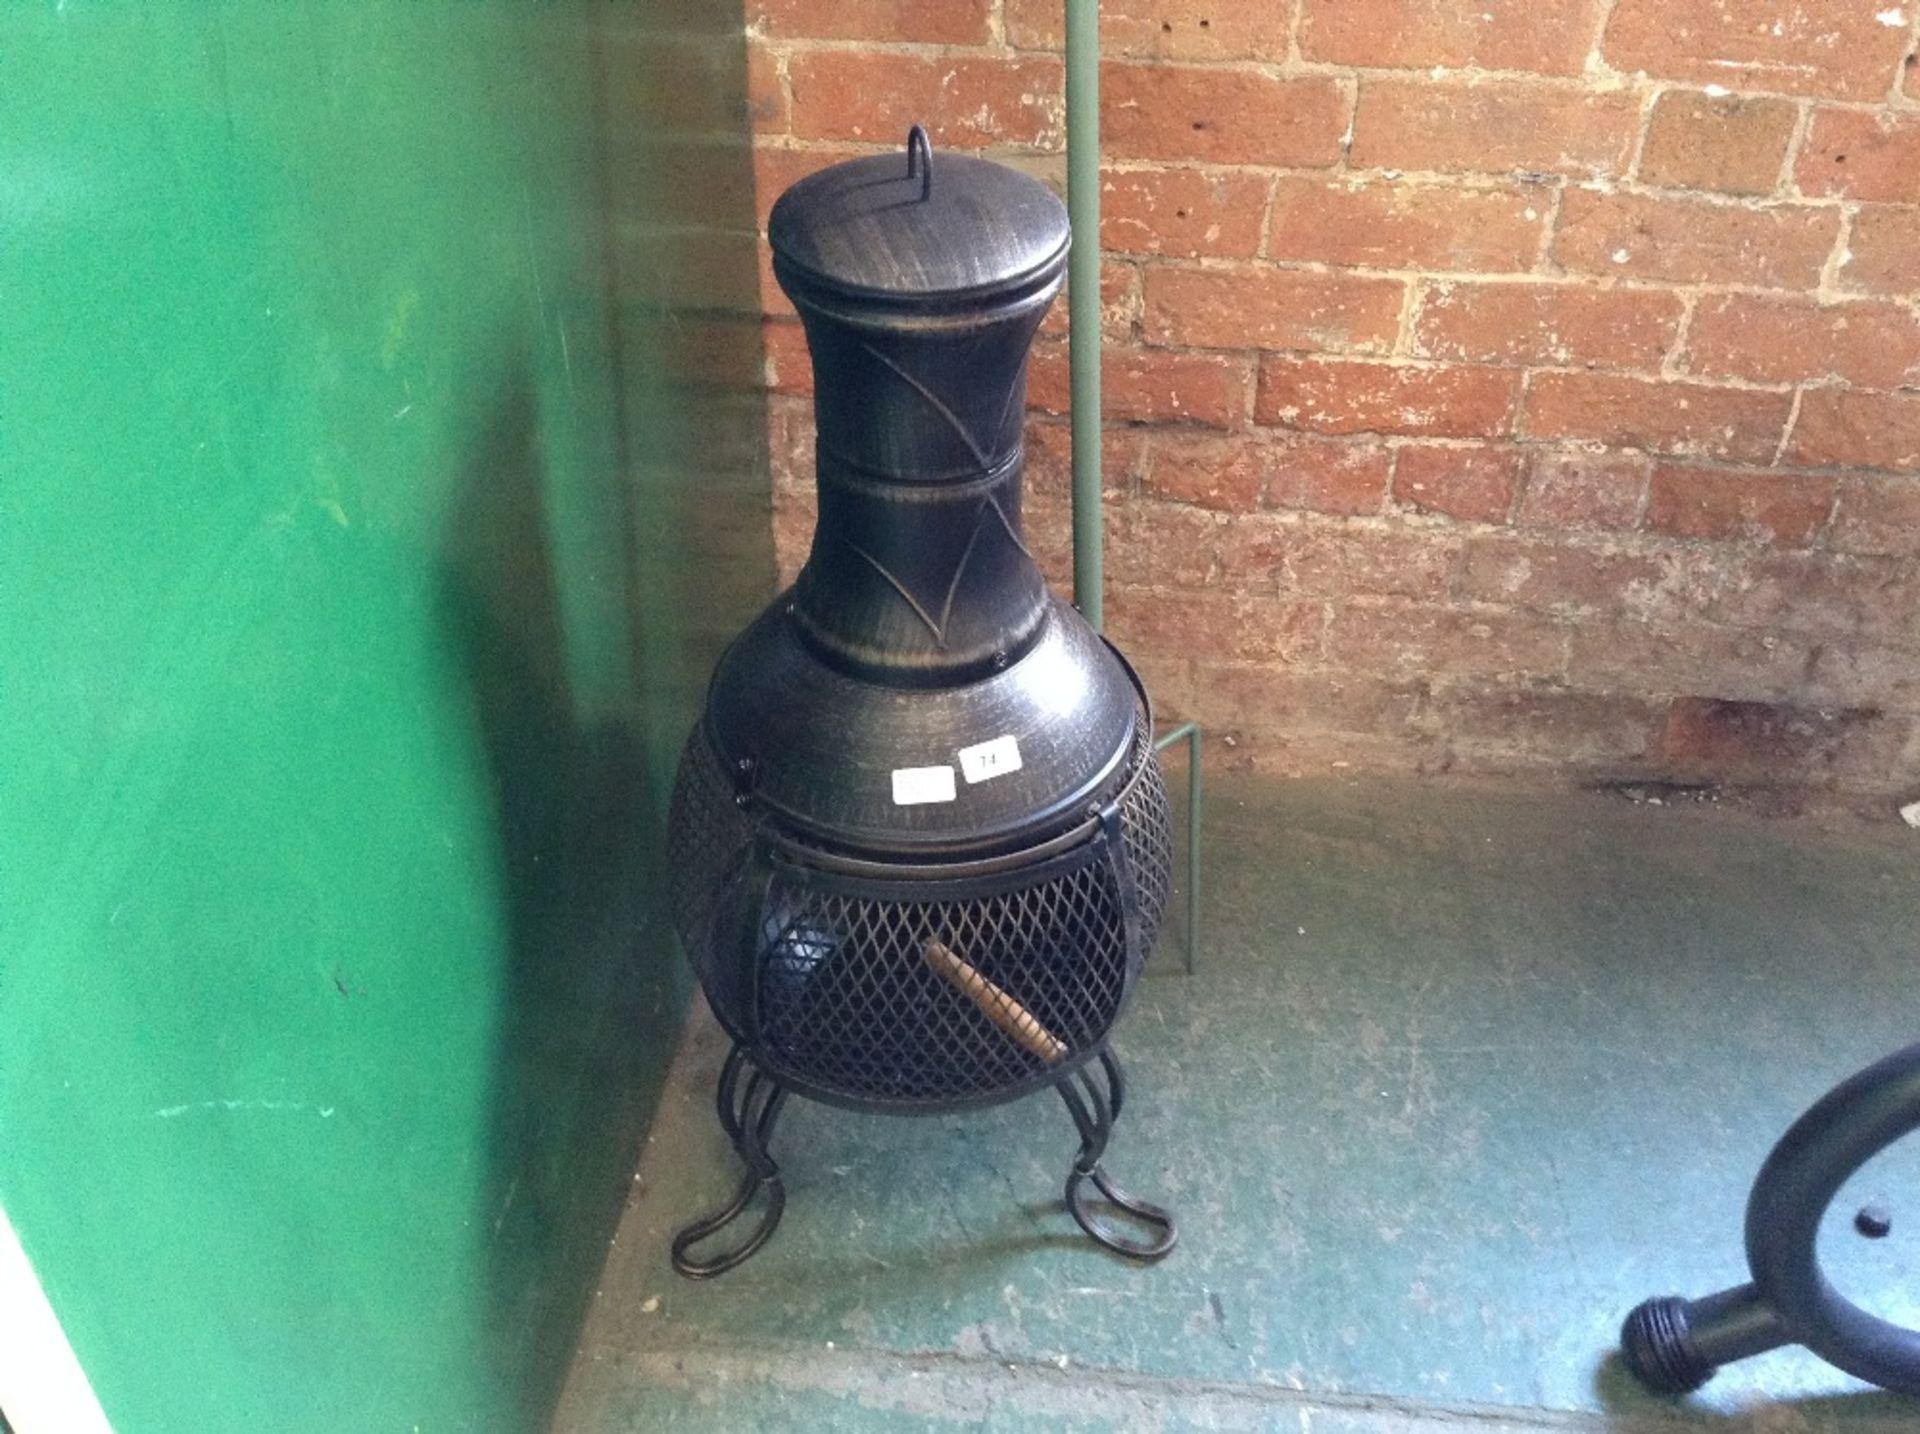 Lot 74 - Gardeco Kobie Steel Charcoal/Wood Burning Chiminea (GGGD1399 - 12369/1)